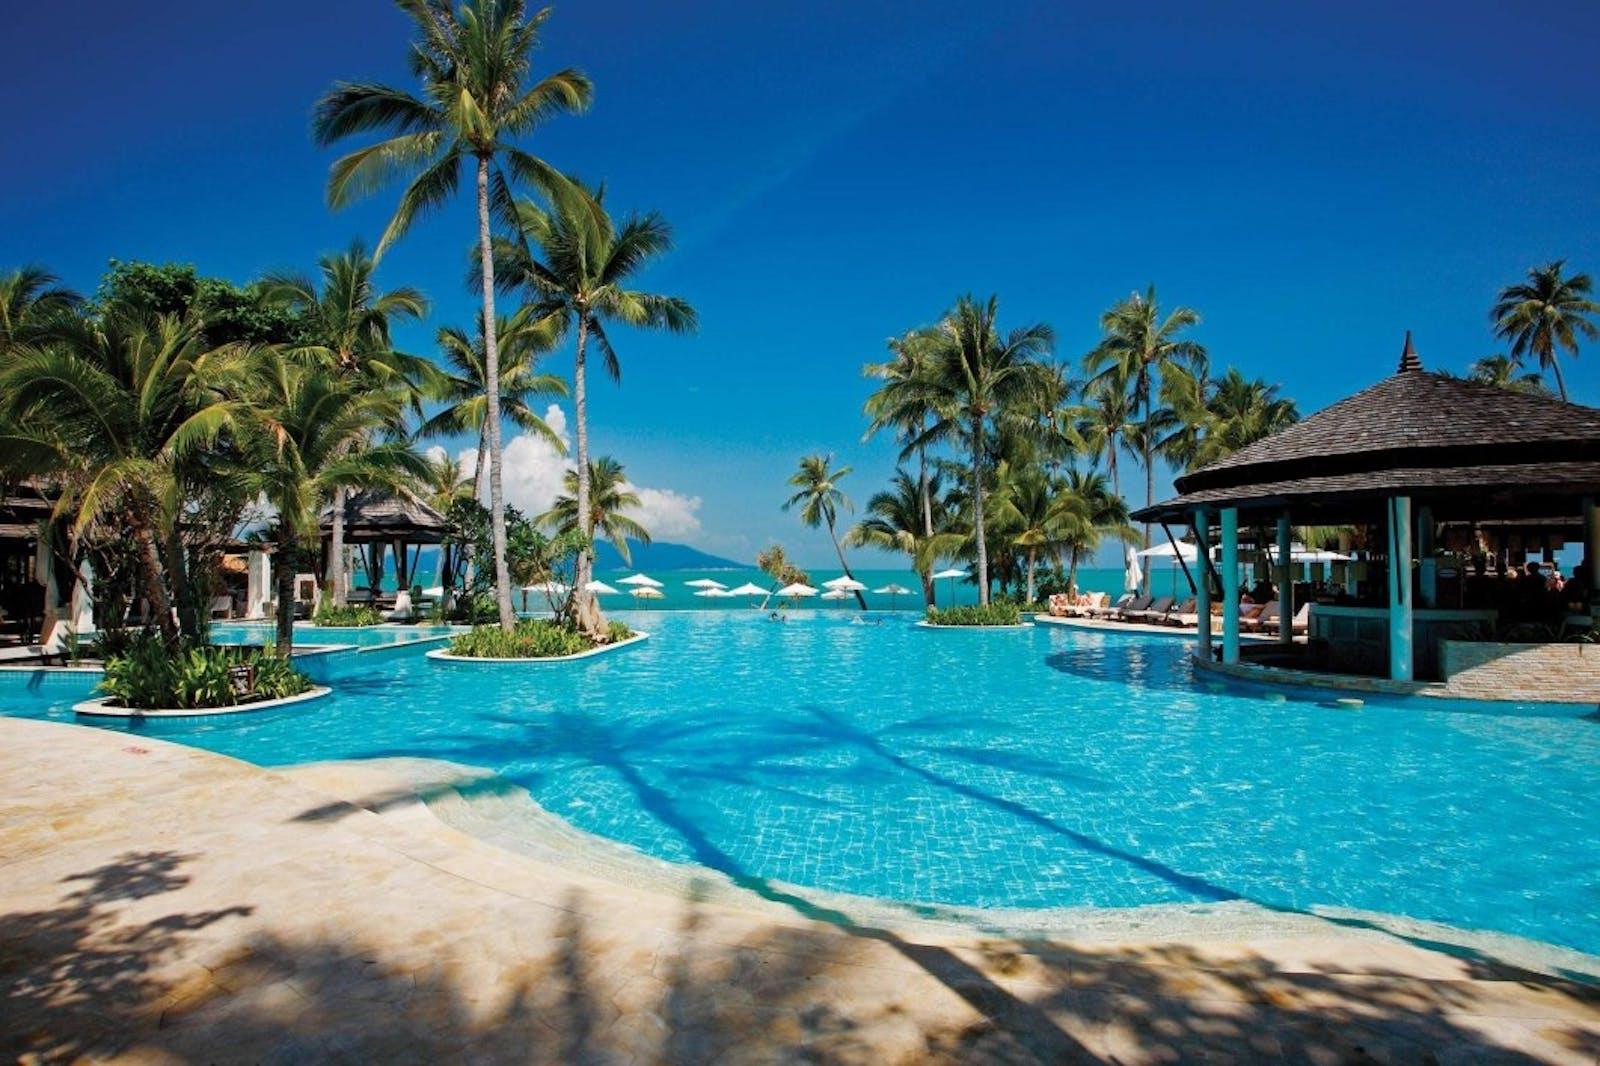 Melati Beach Resort And Spa Luxury Hotels In Koh Samui